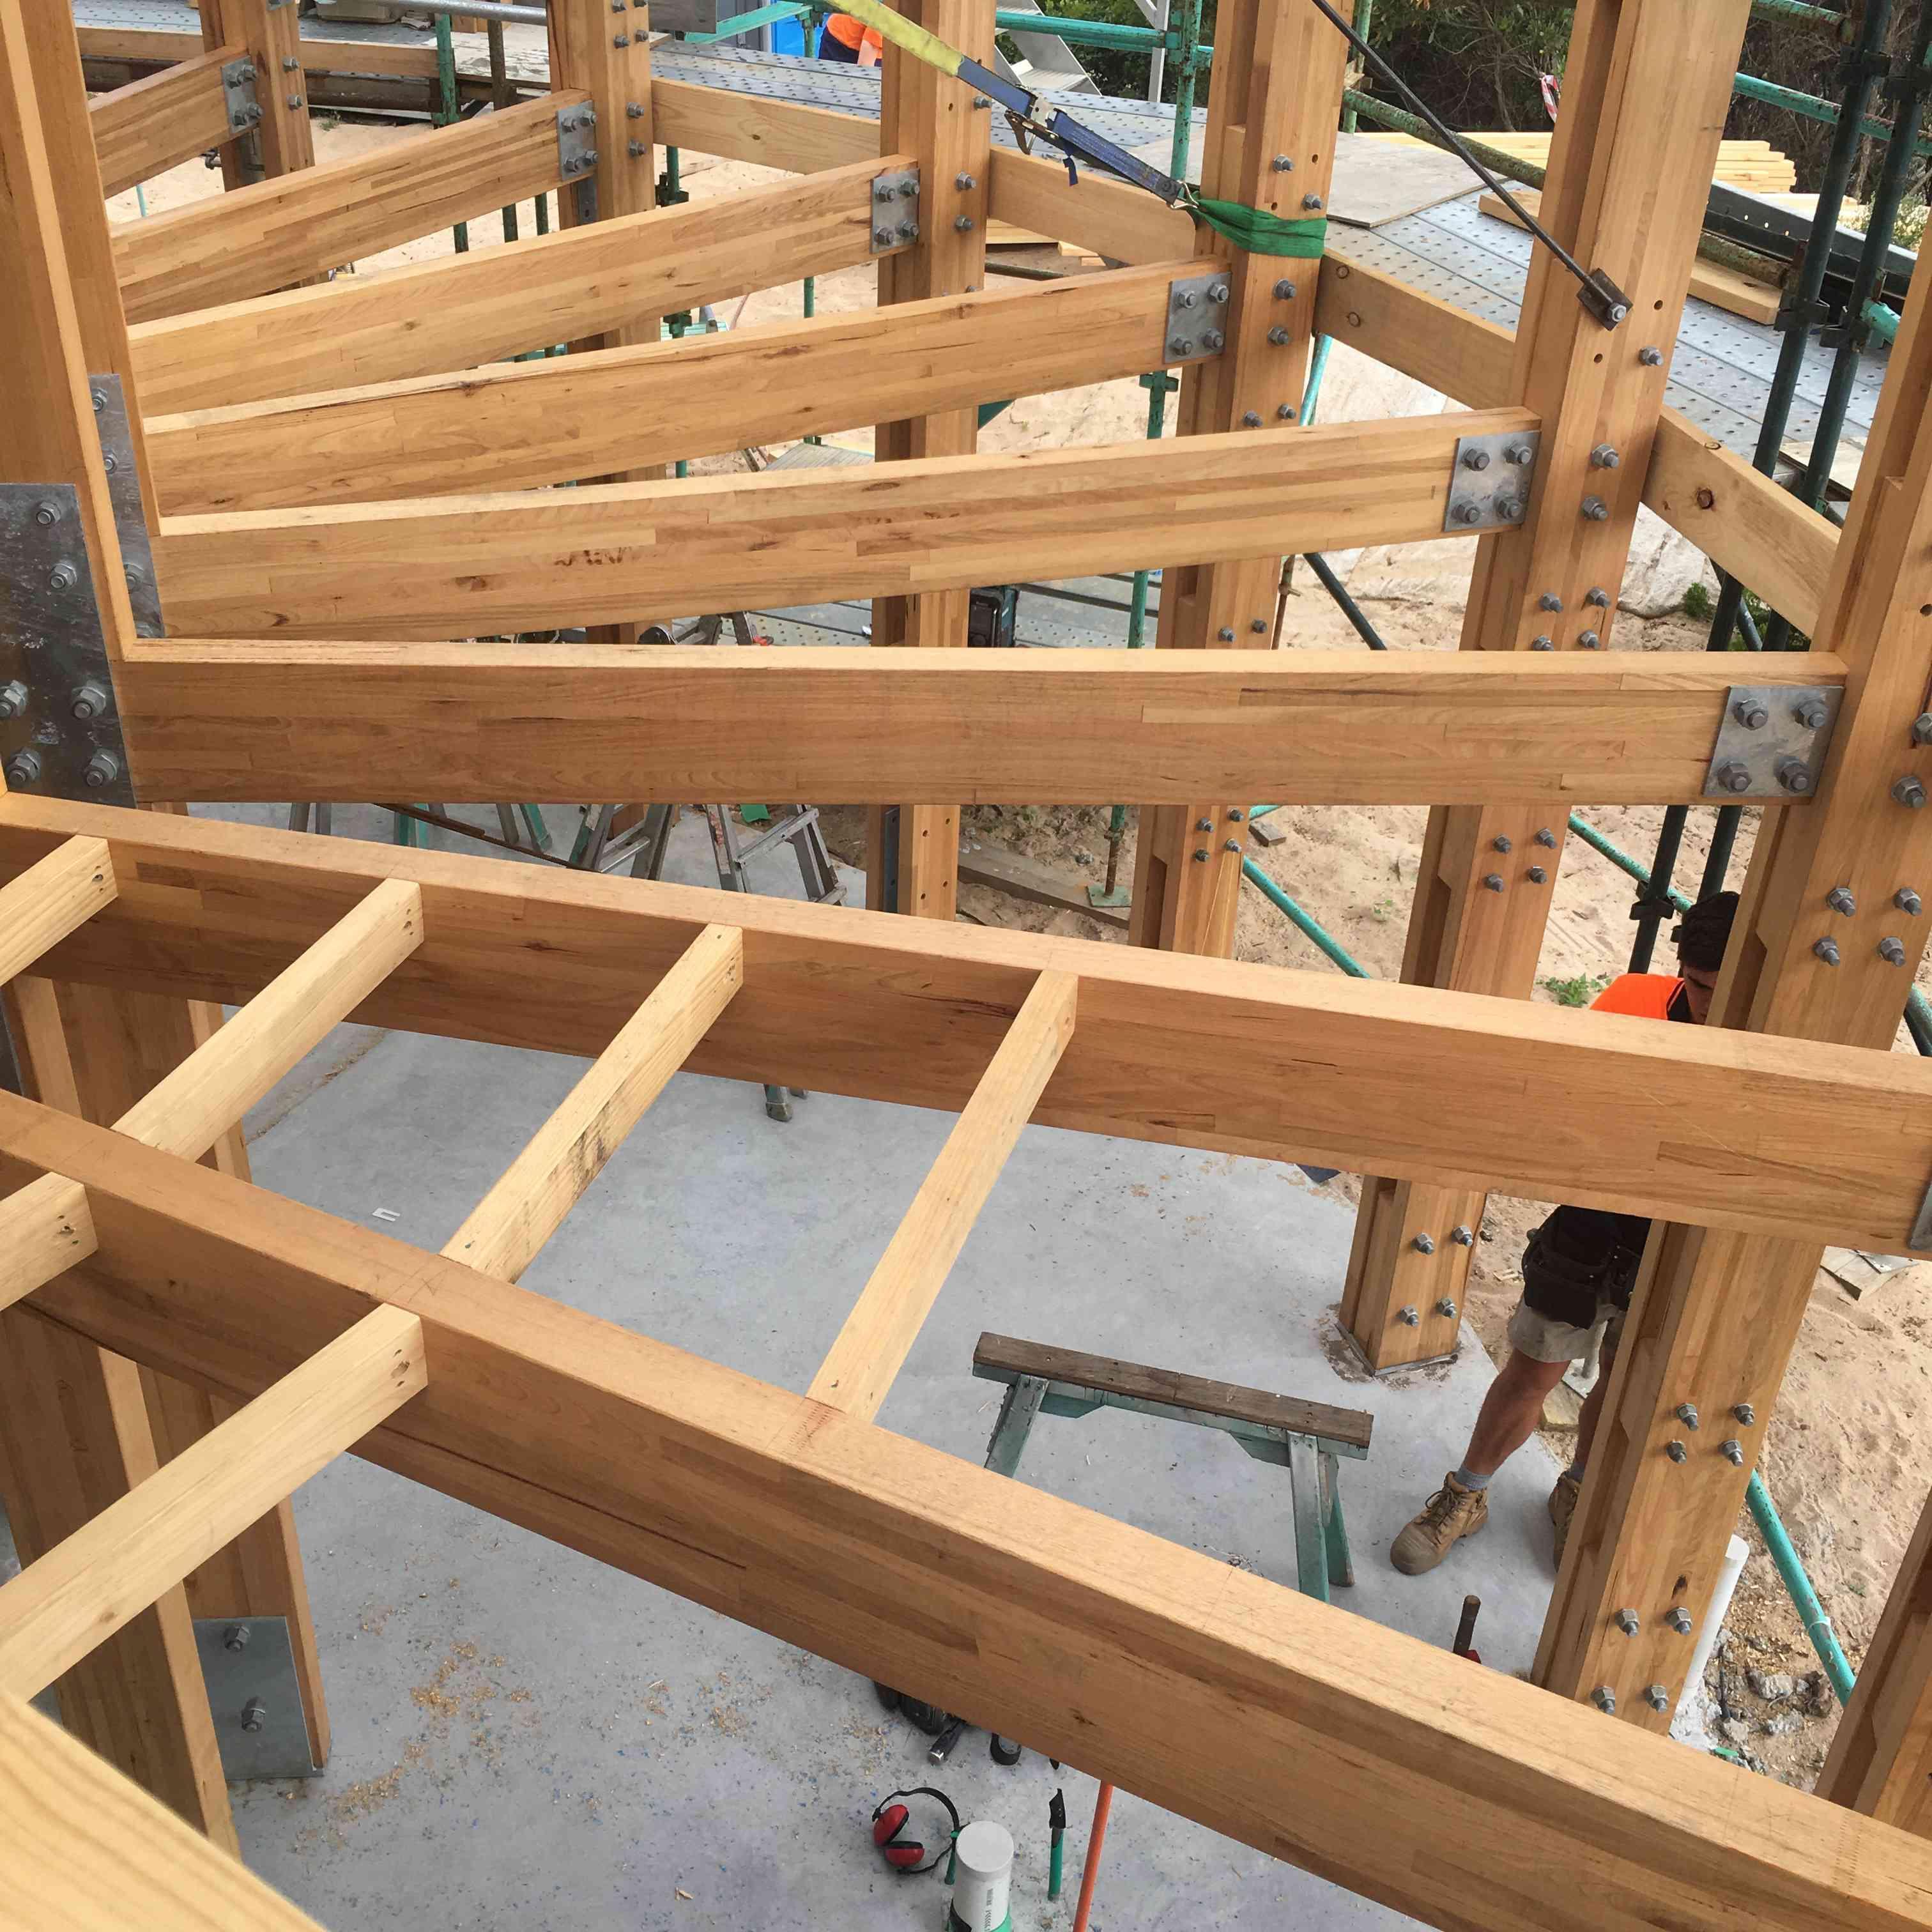 wood framing under construction